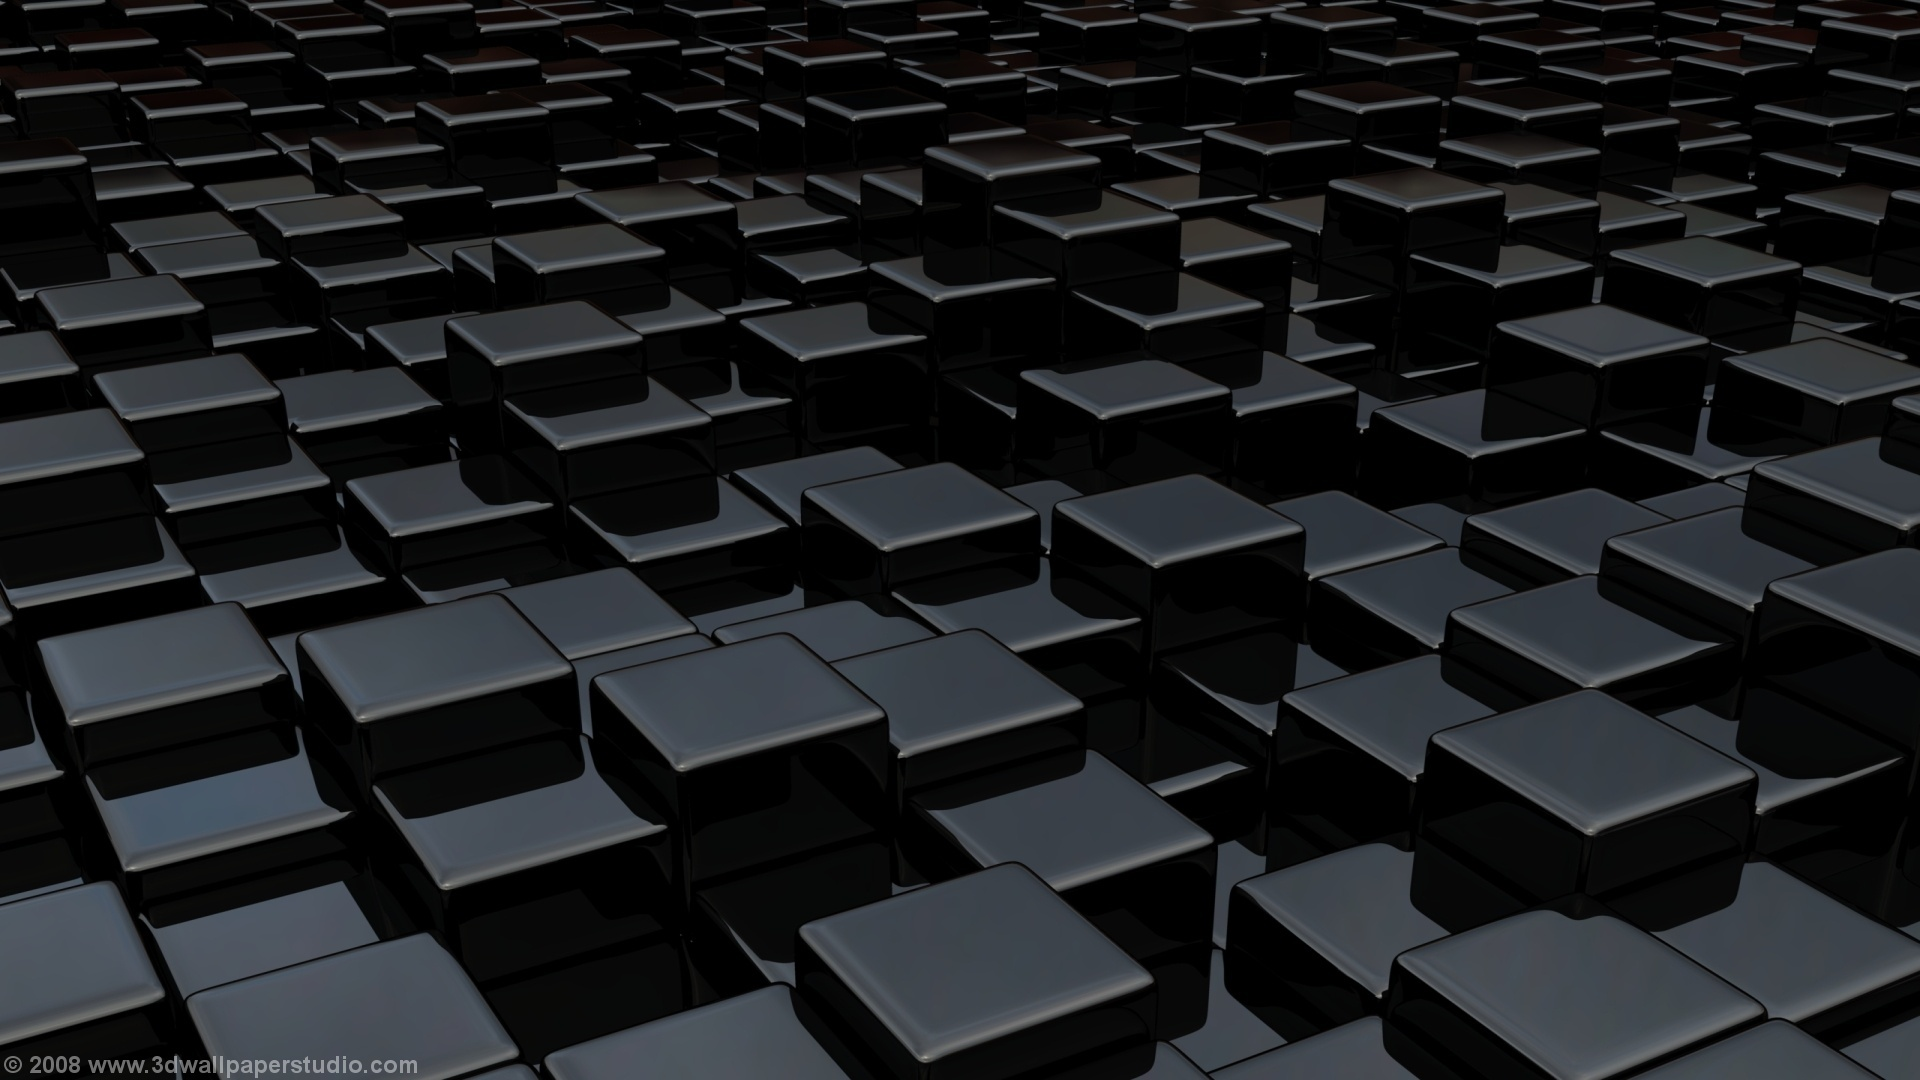 in black 3d amazing black hq wallpaper black 3d 3d wallpaper black 1920x1080